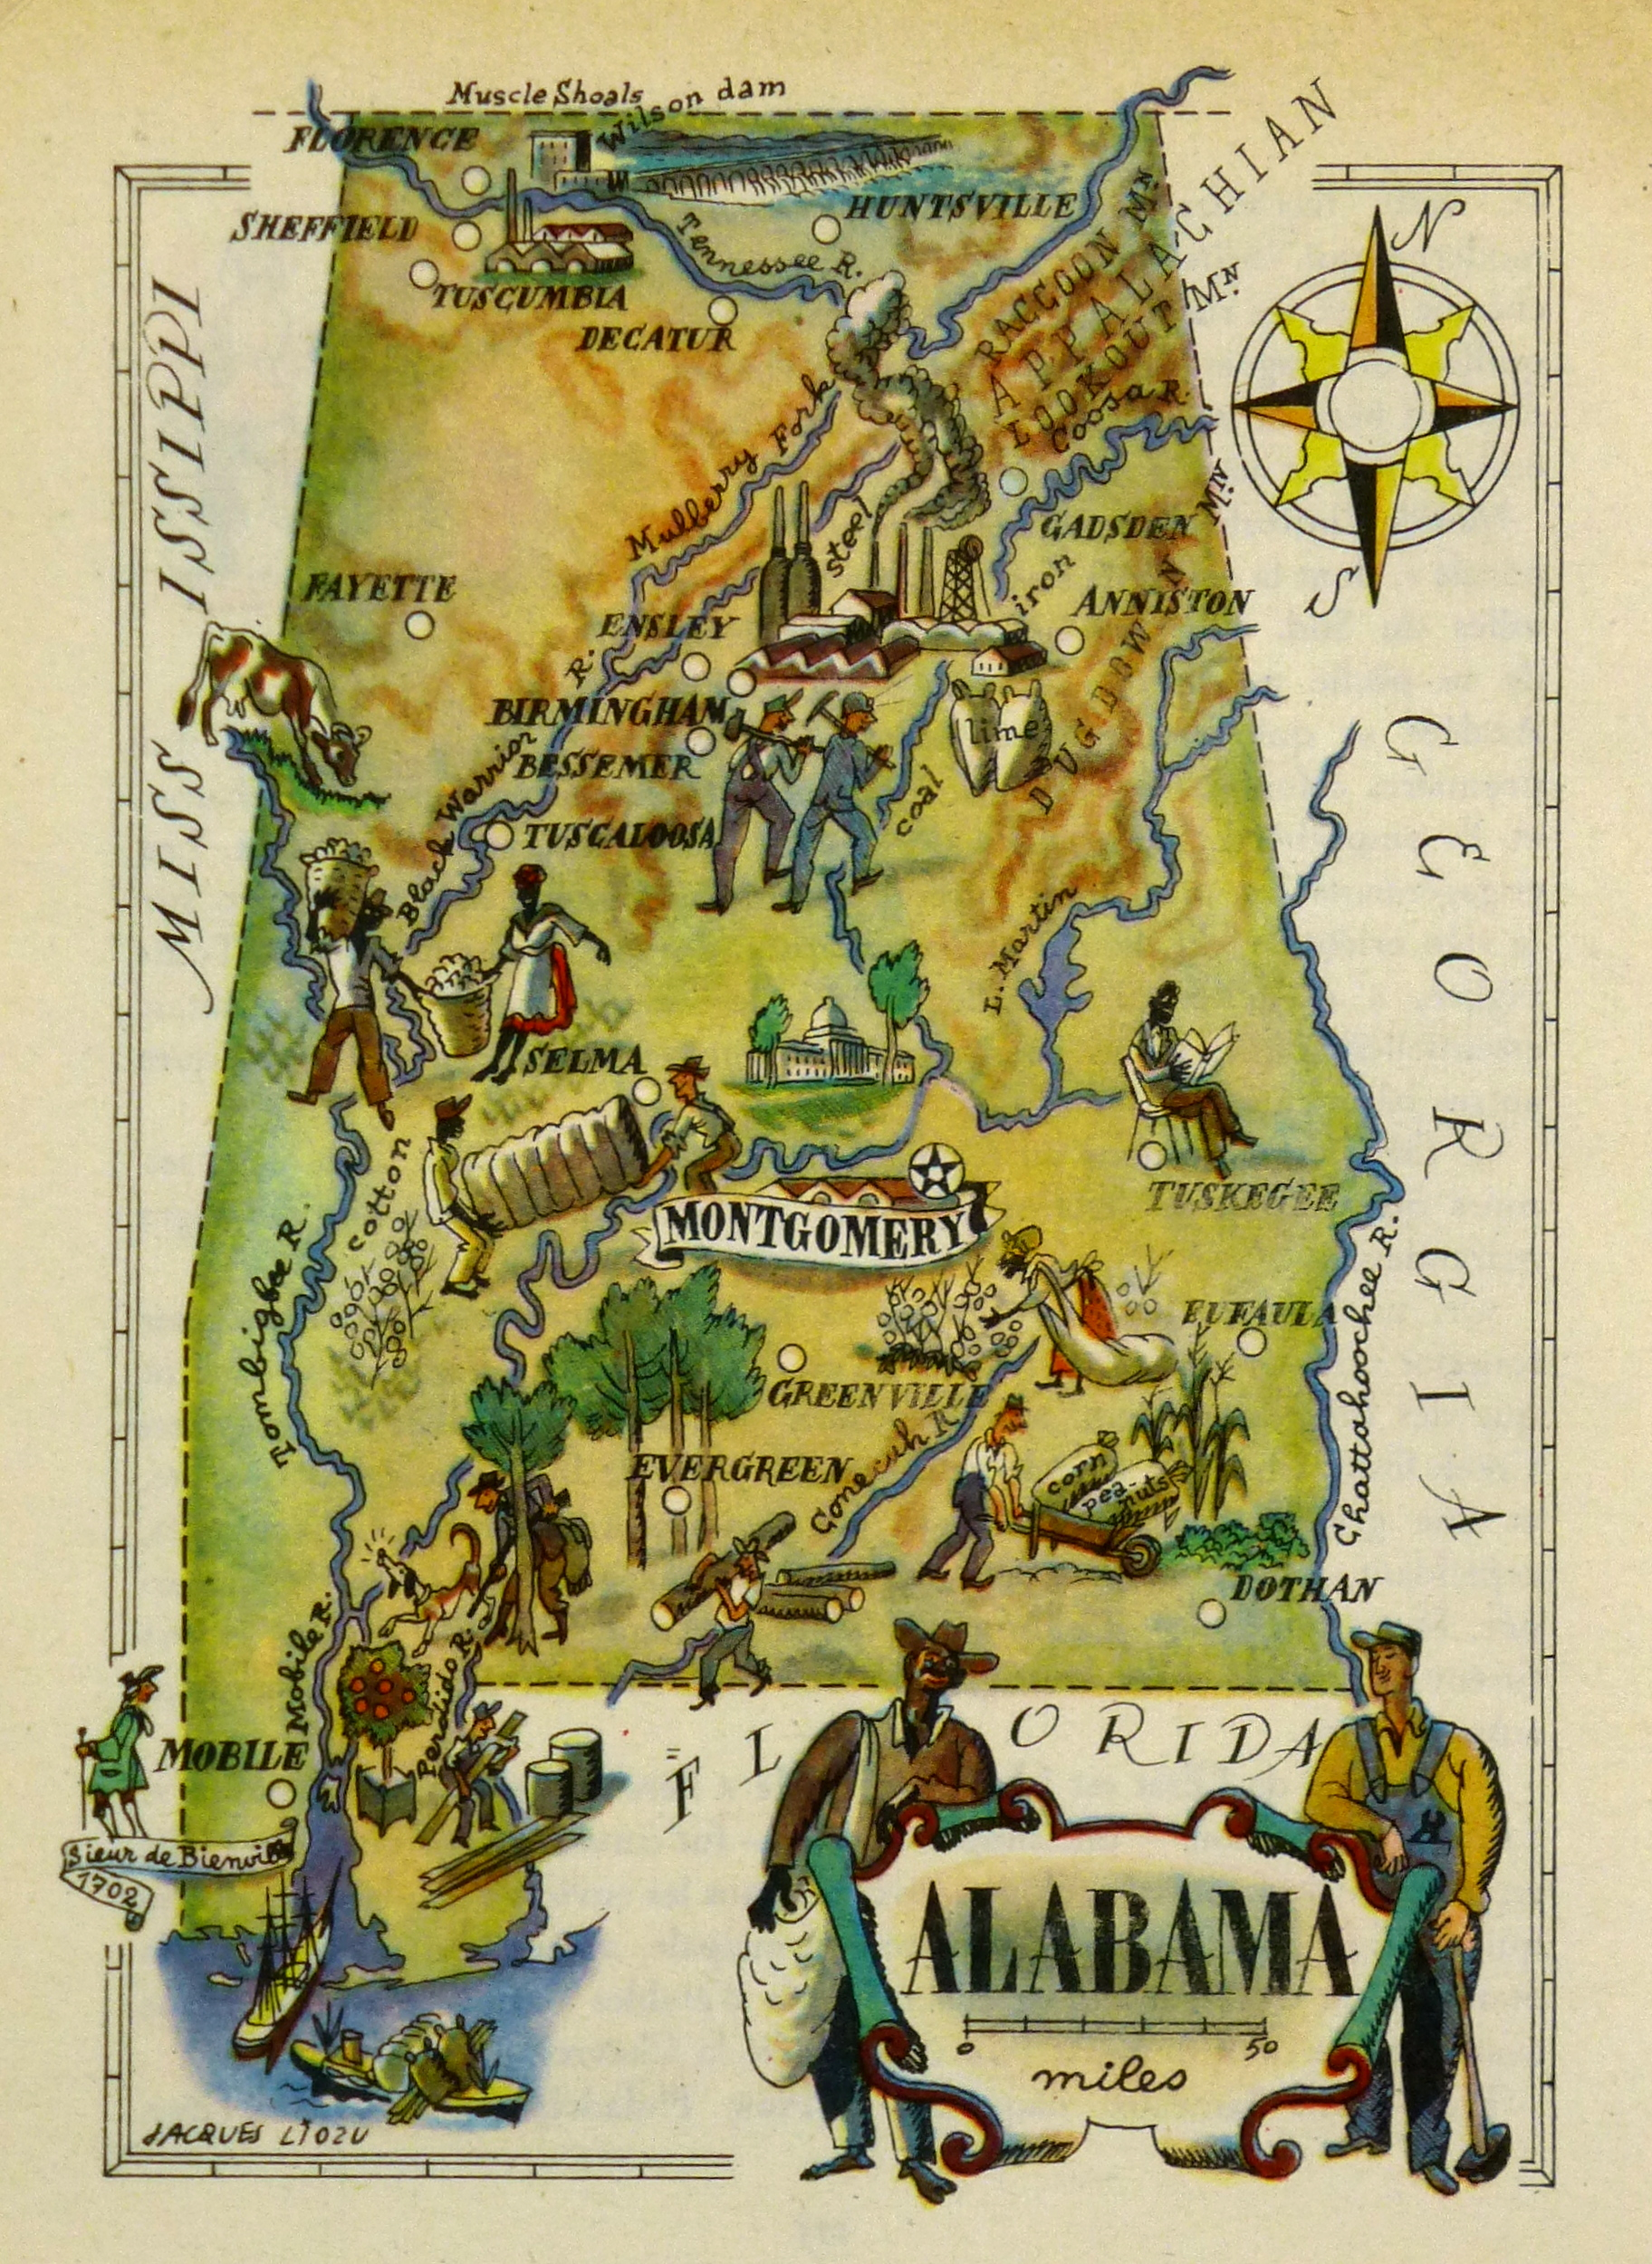 Pictorial Map - Alabama, 1946-main-6255K